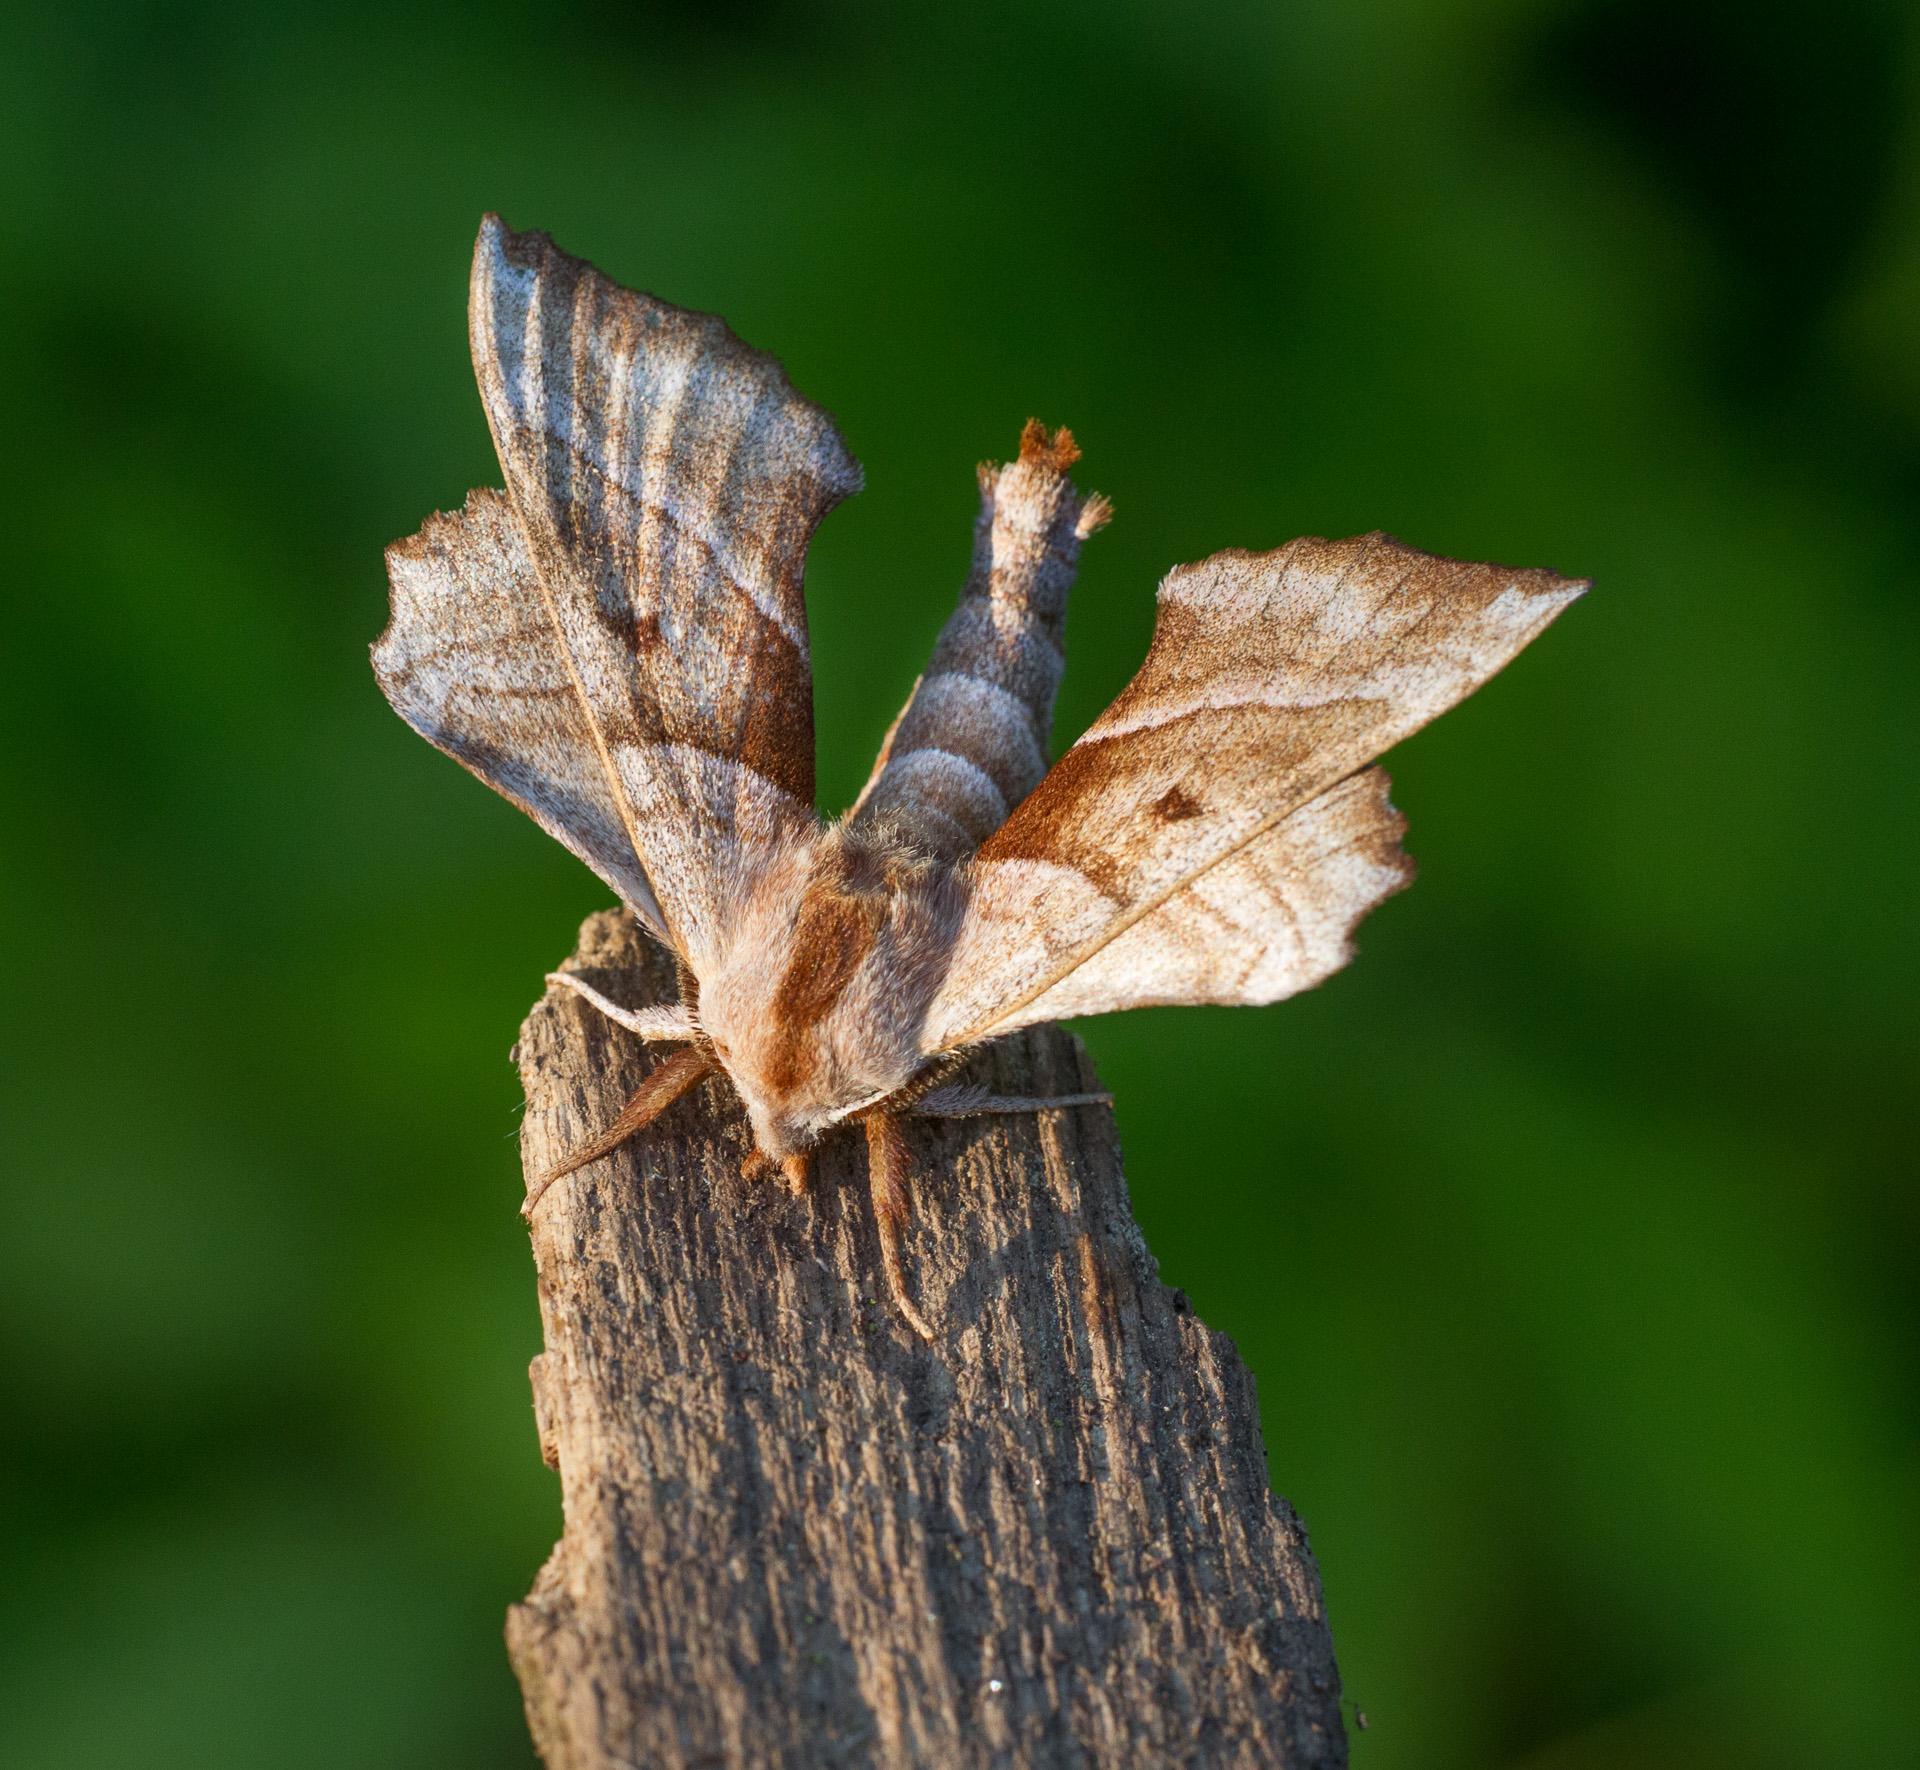 Amorpha juglandis Walnut Sphinx 7827 Family Sphingidae Skogstjarna Carlton County MNIMG_0801